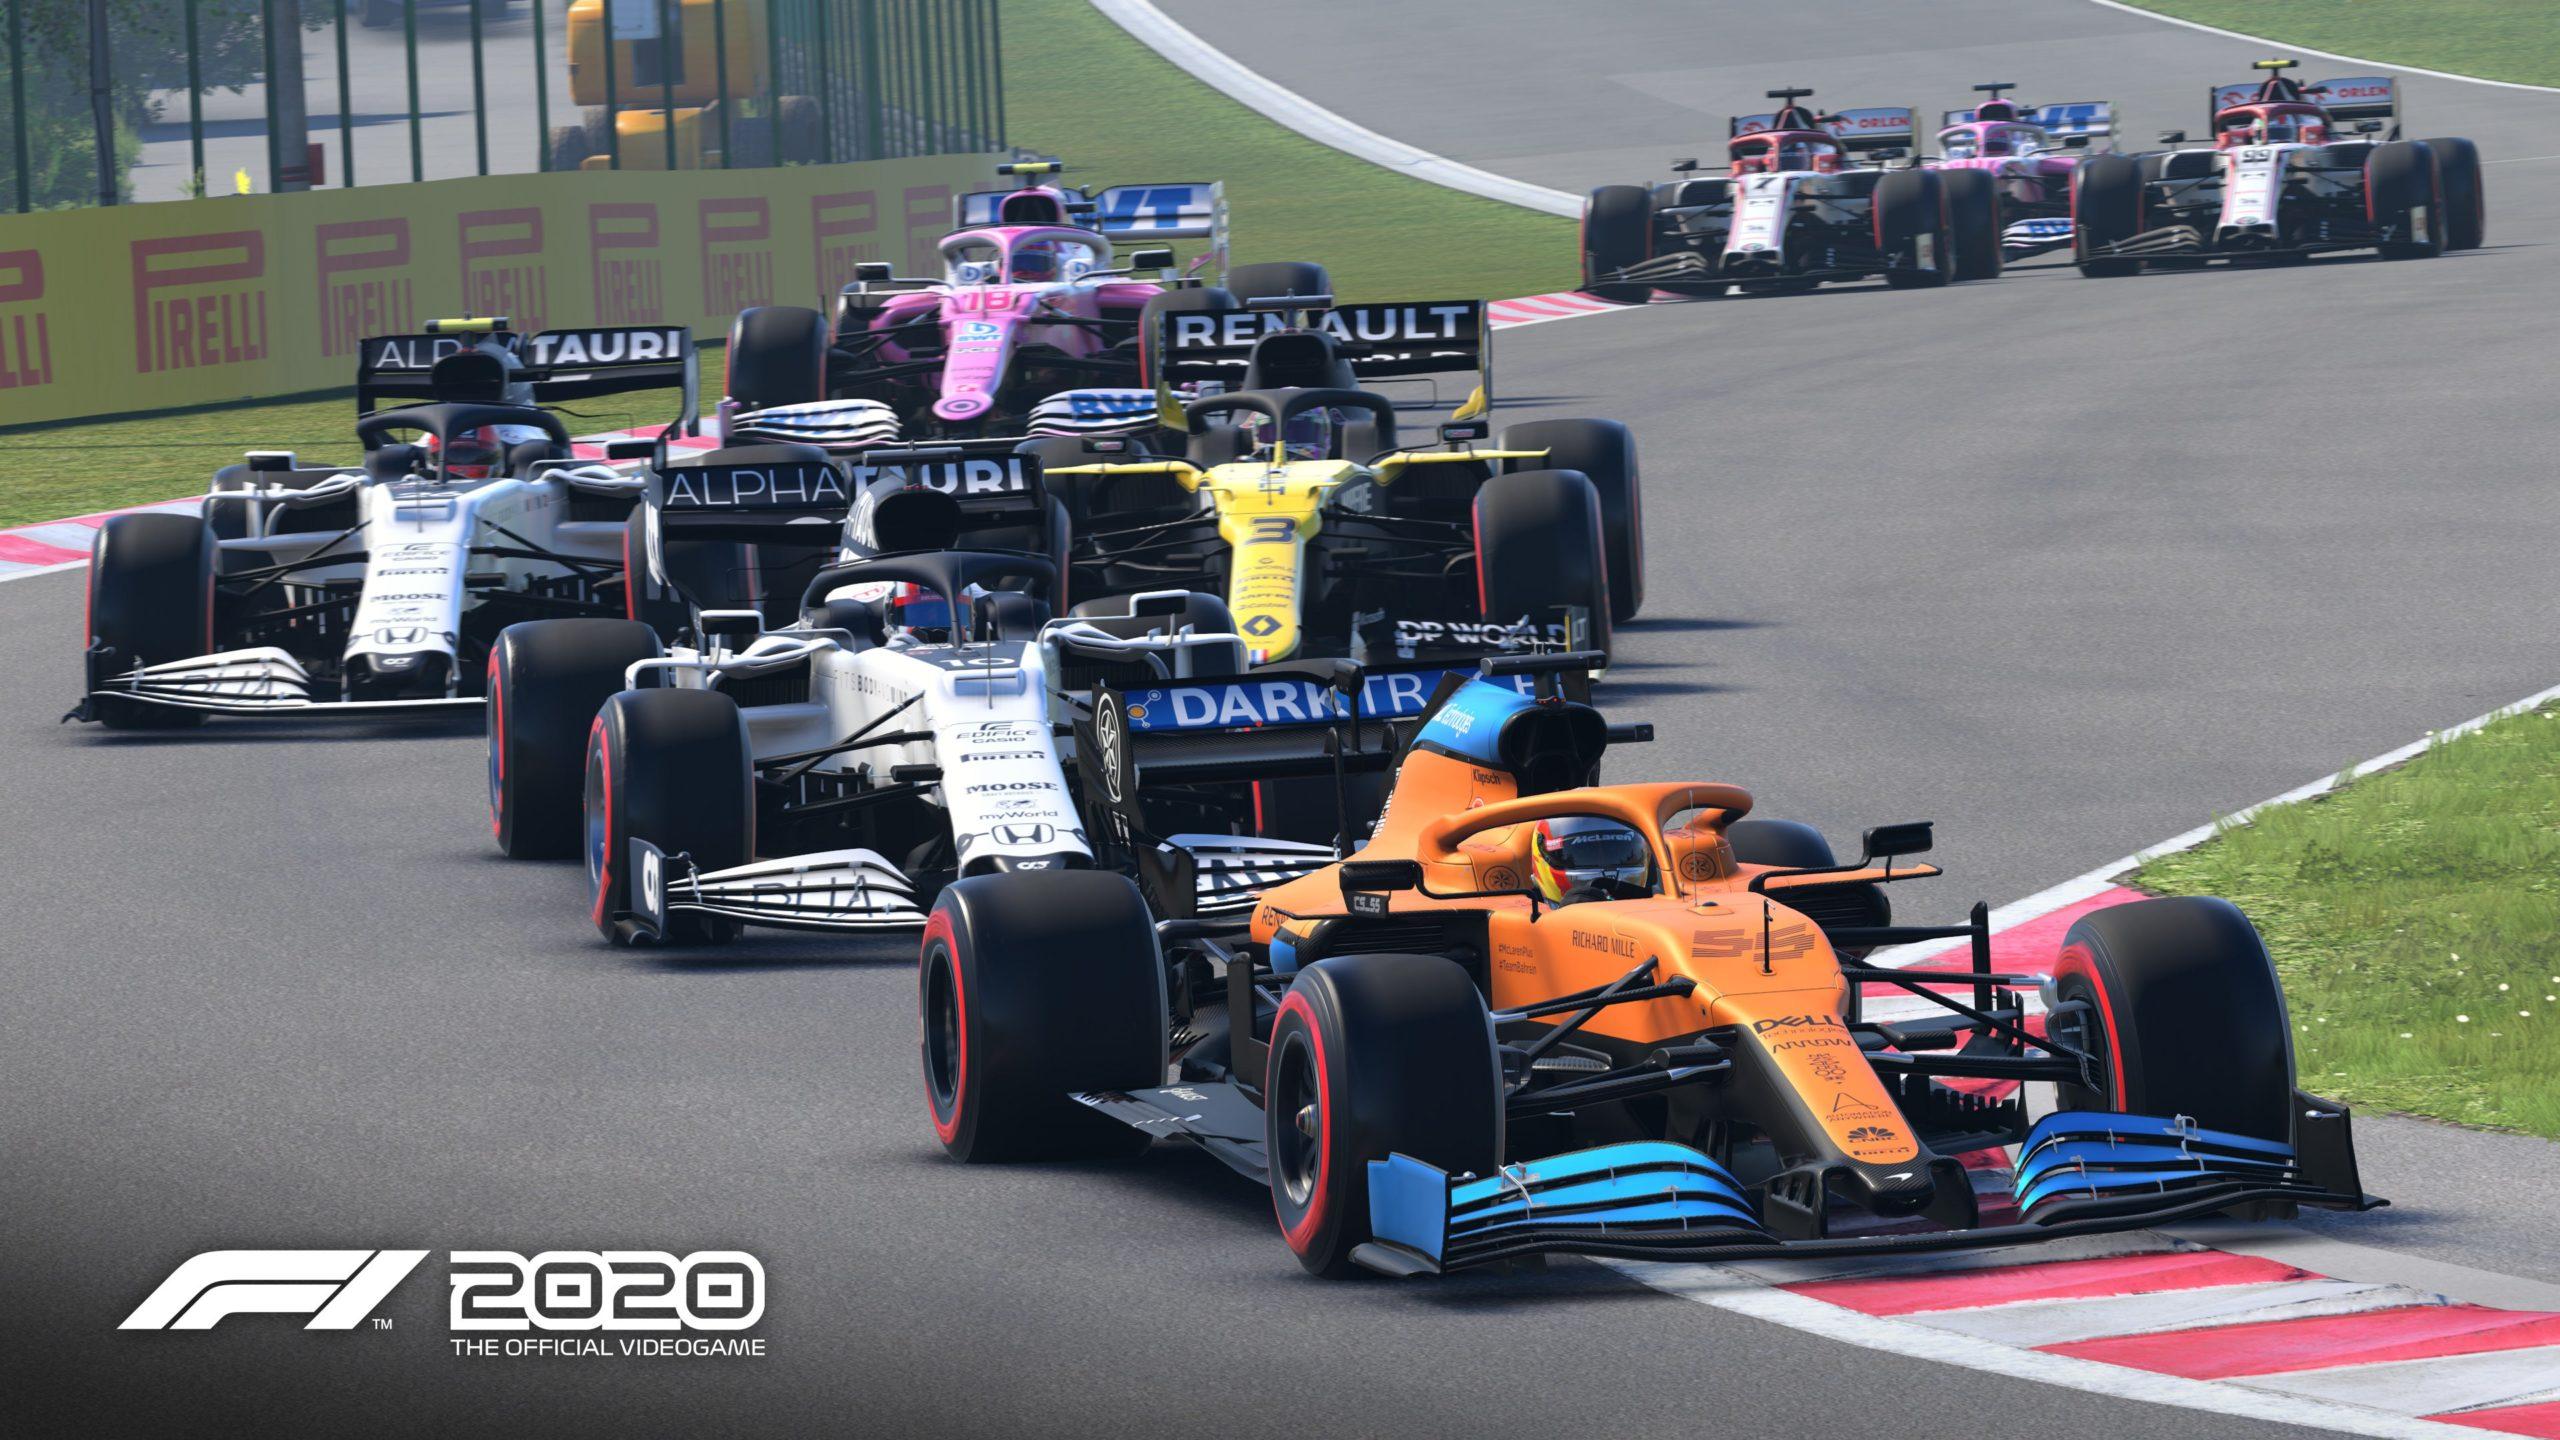 F1-2020_Hungary_Screen_13_4K